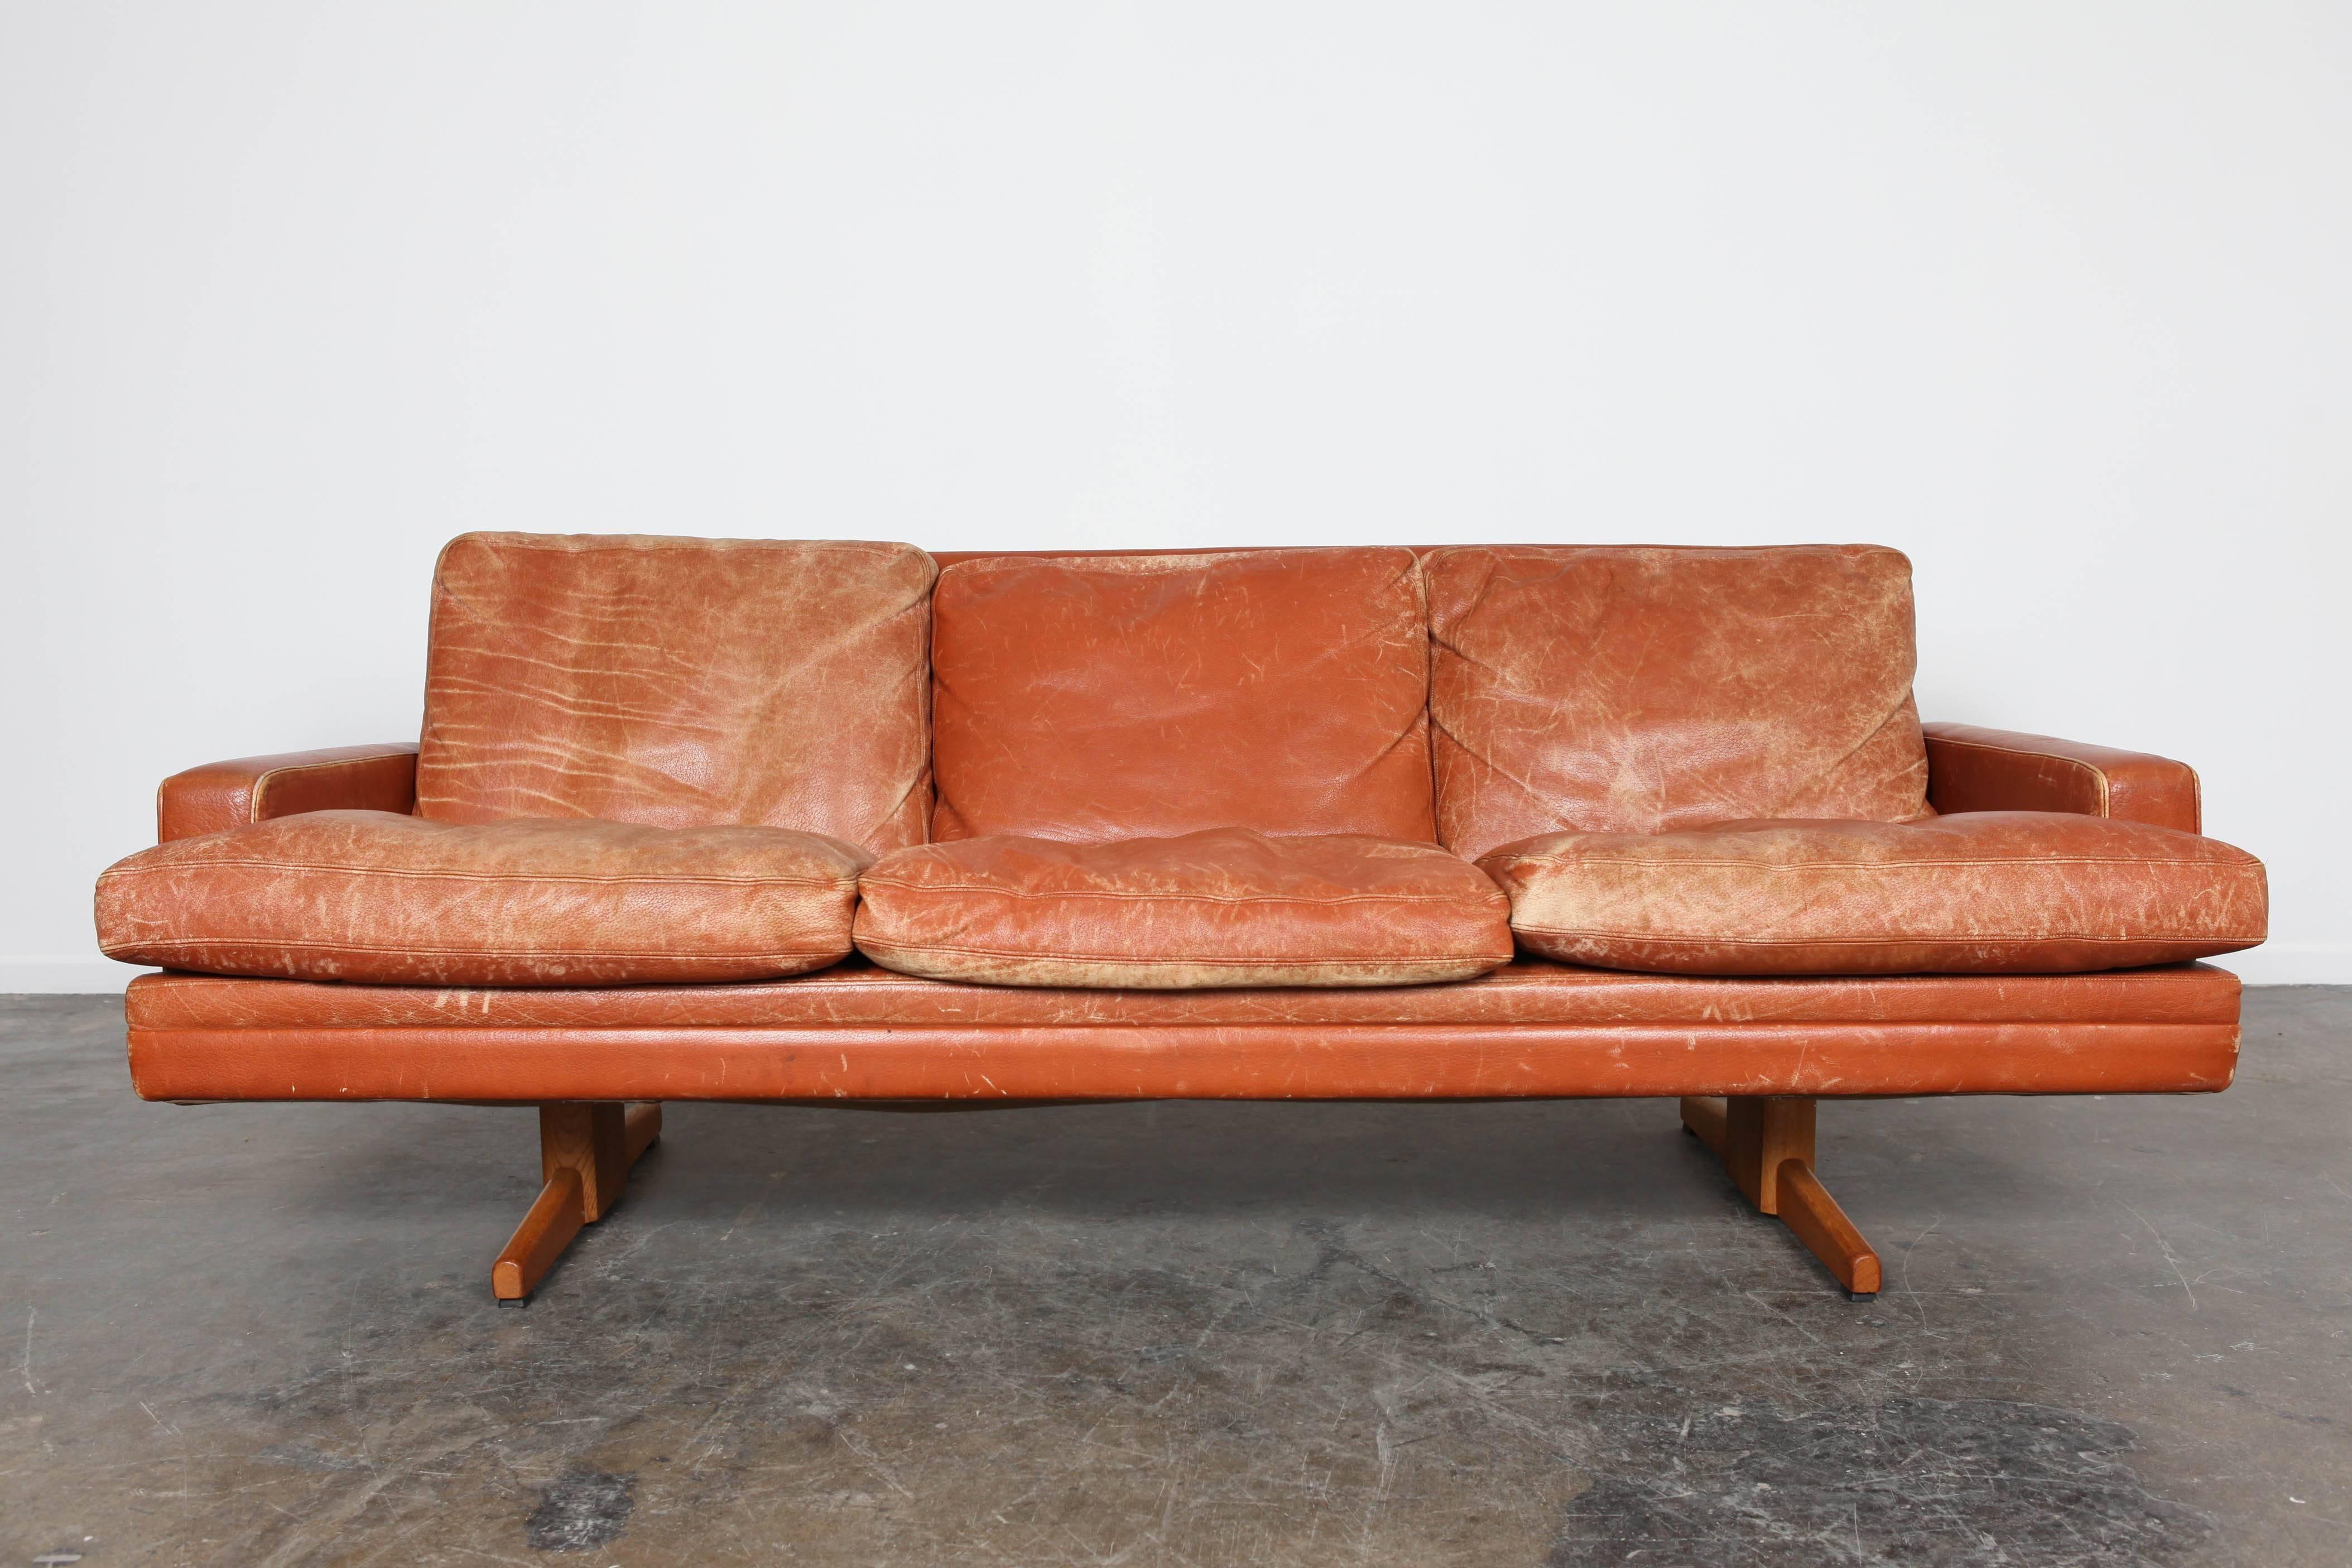 Norwegian Mid Century Modern Burnt Orange Leather Sofa By Fredrik Kayser 2